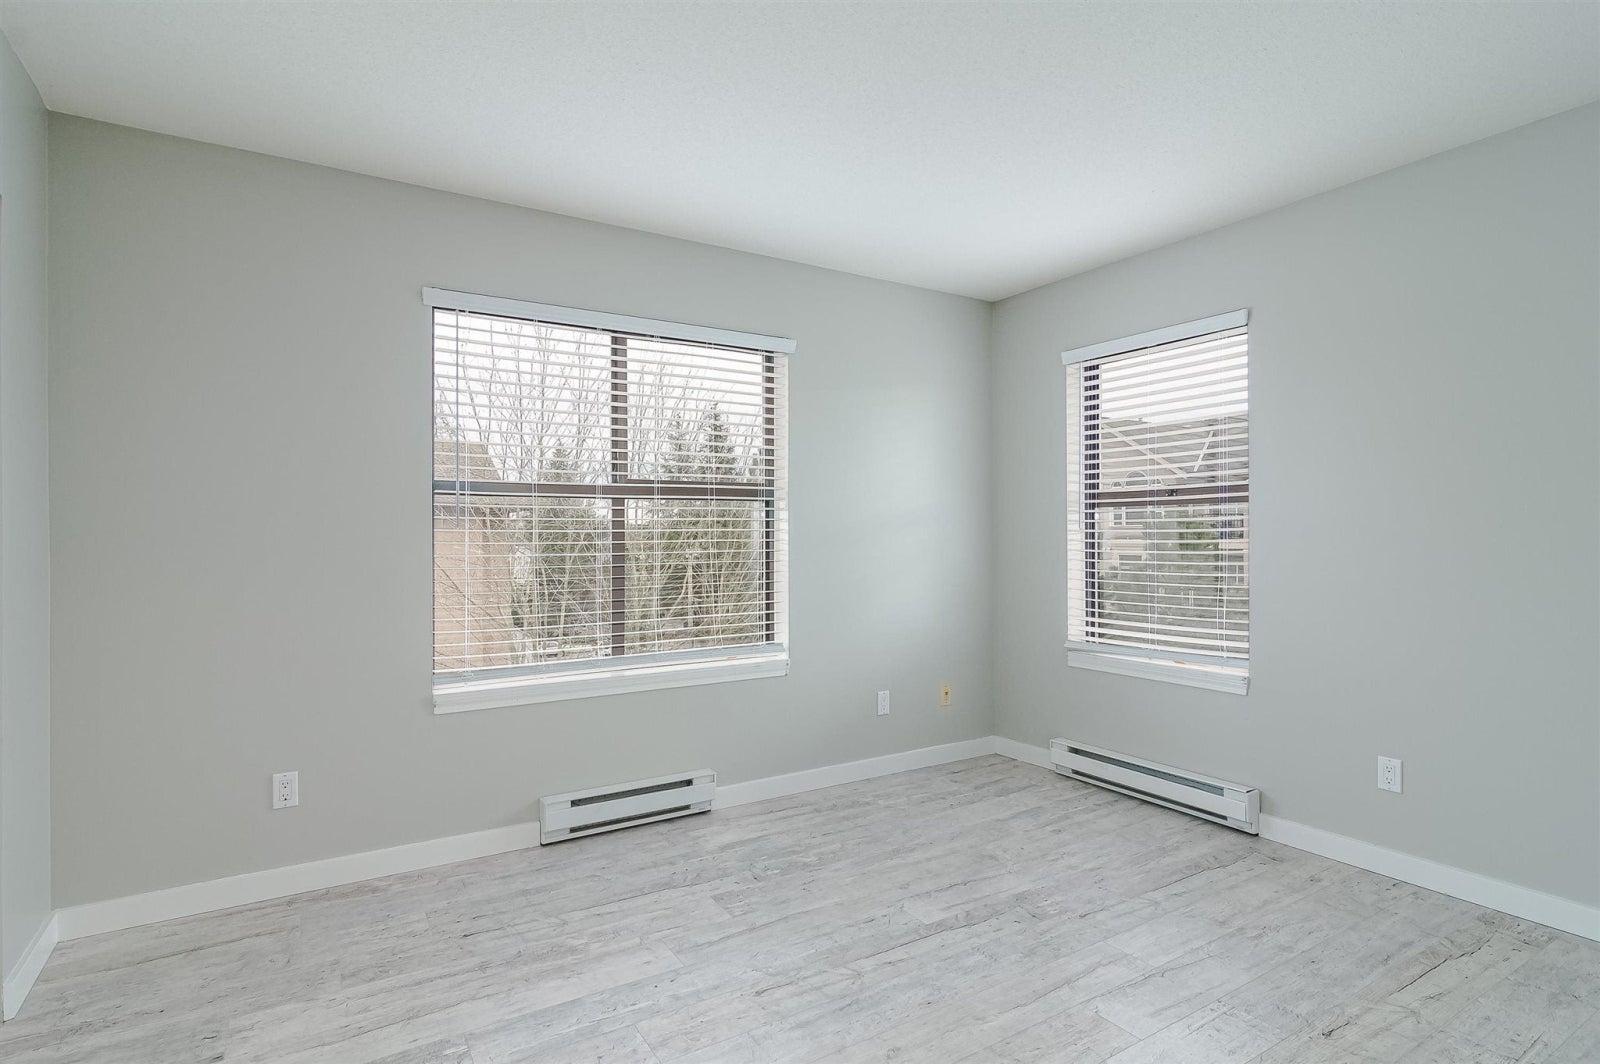 405 20268 54 AVENUE - Langley City Apartment/Condo for sale, 2 Bedrooms (R2604183) #13